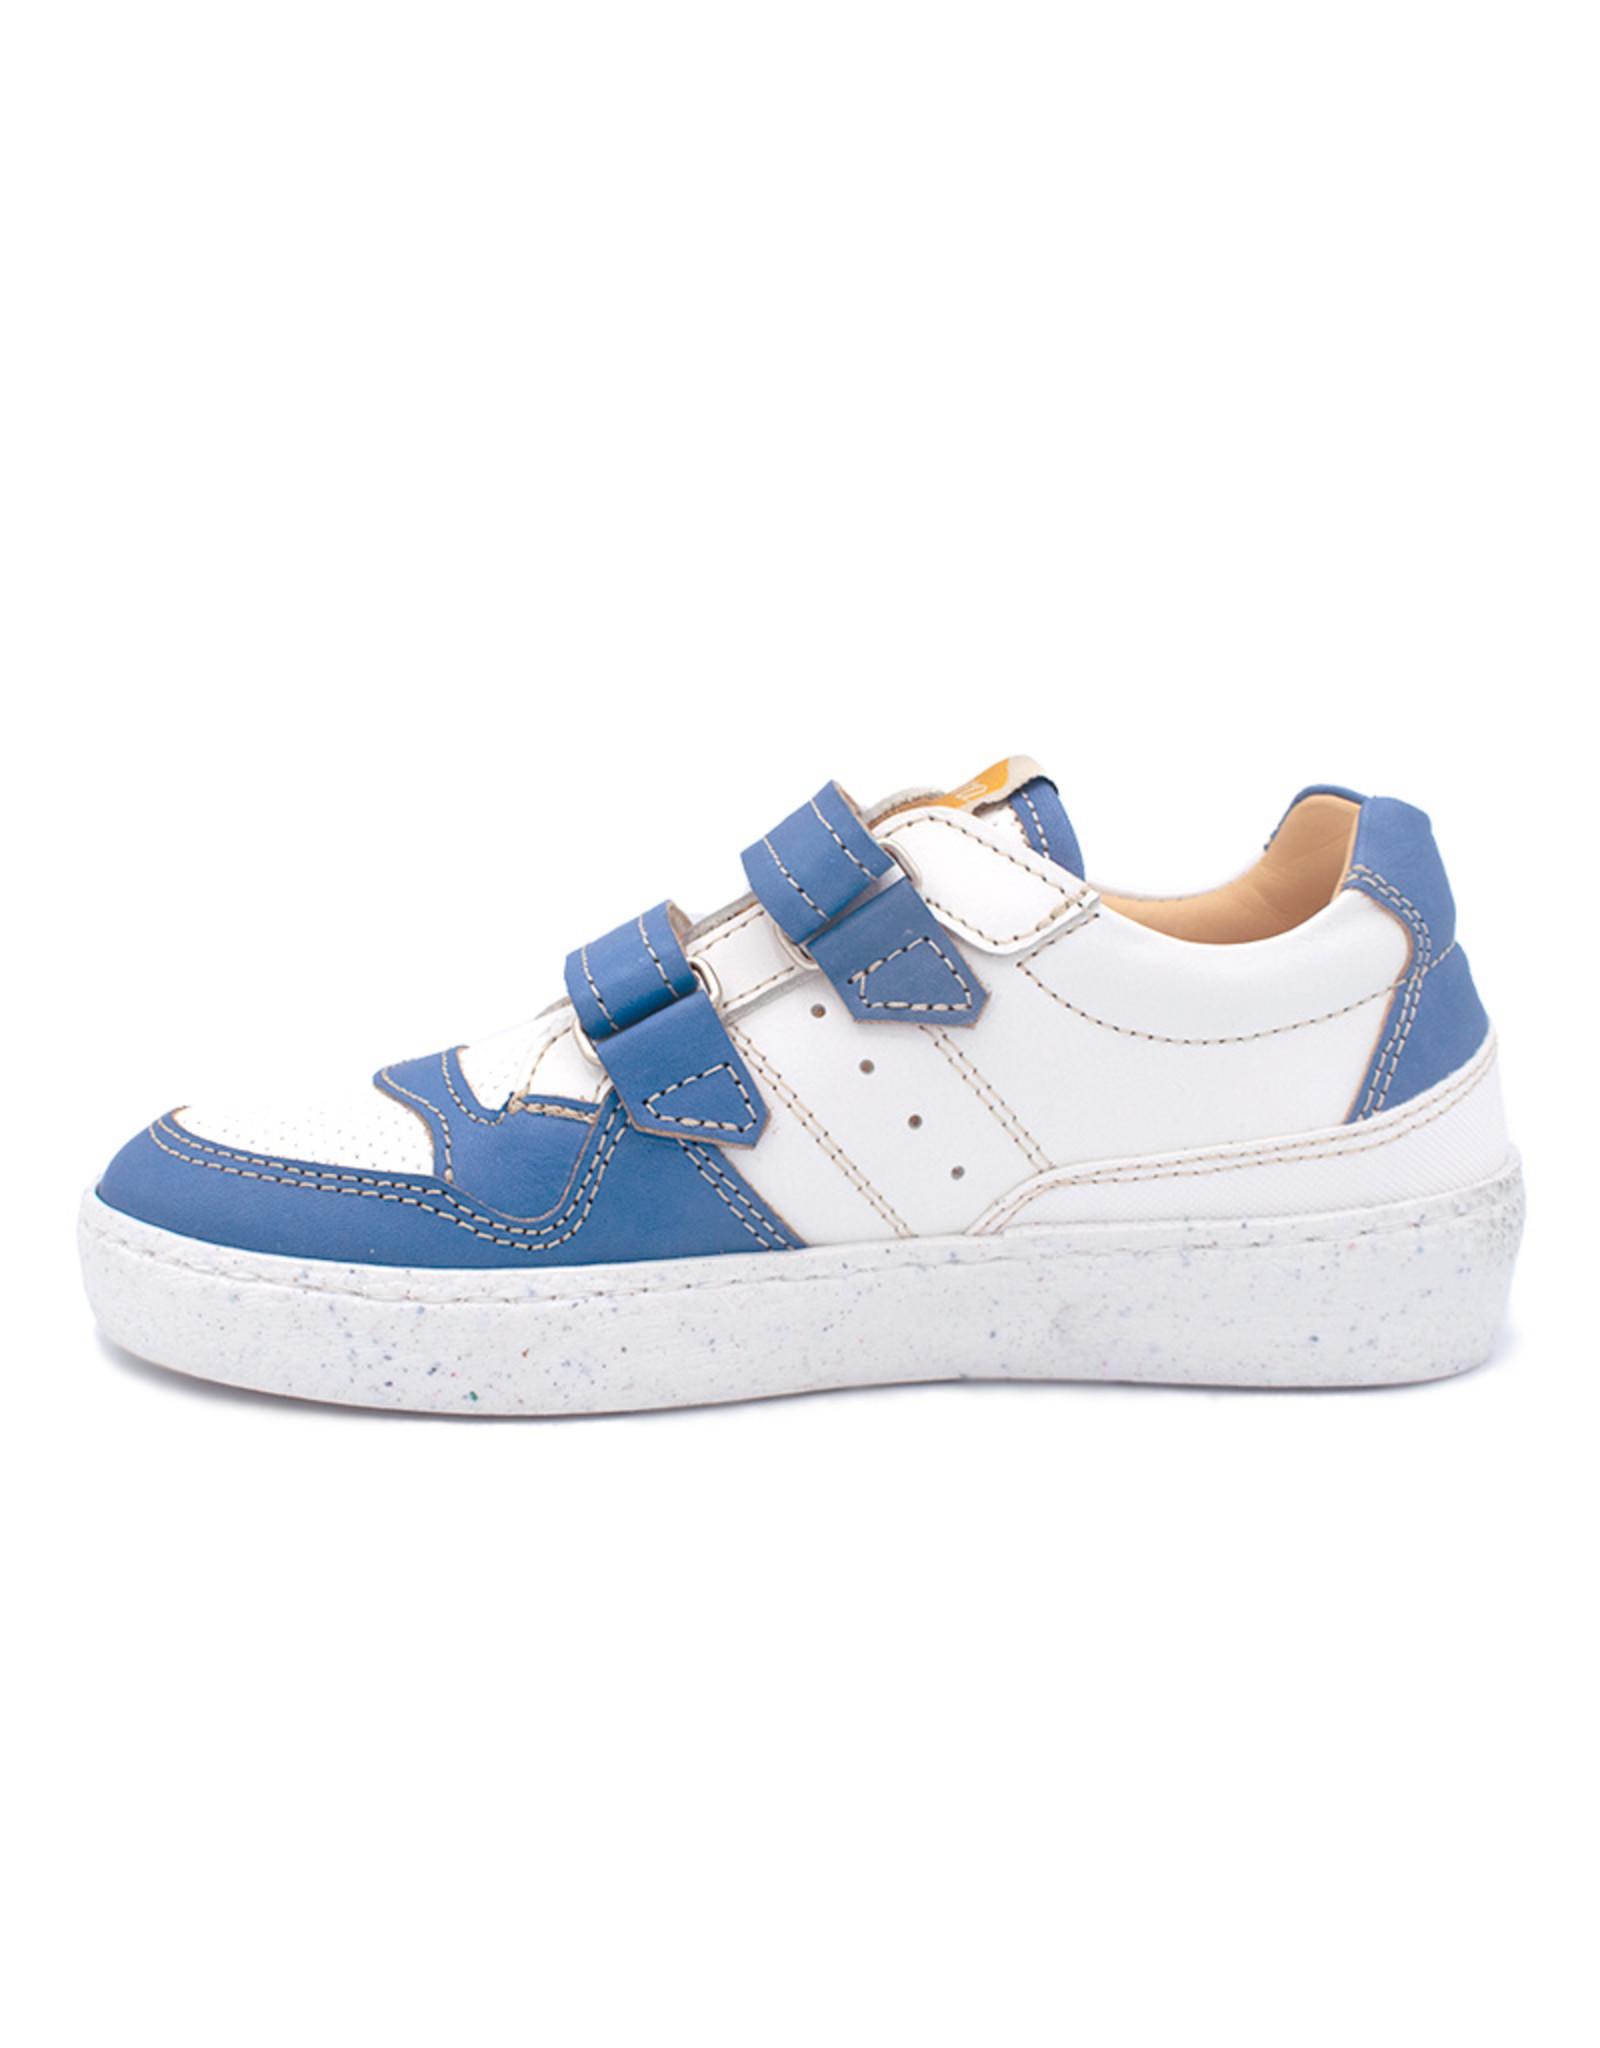 OCRA OCRA sneaker blauw wit velcro